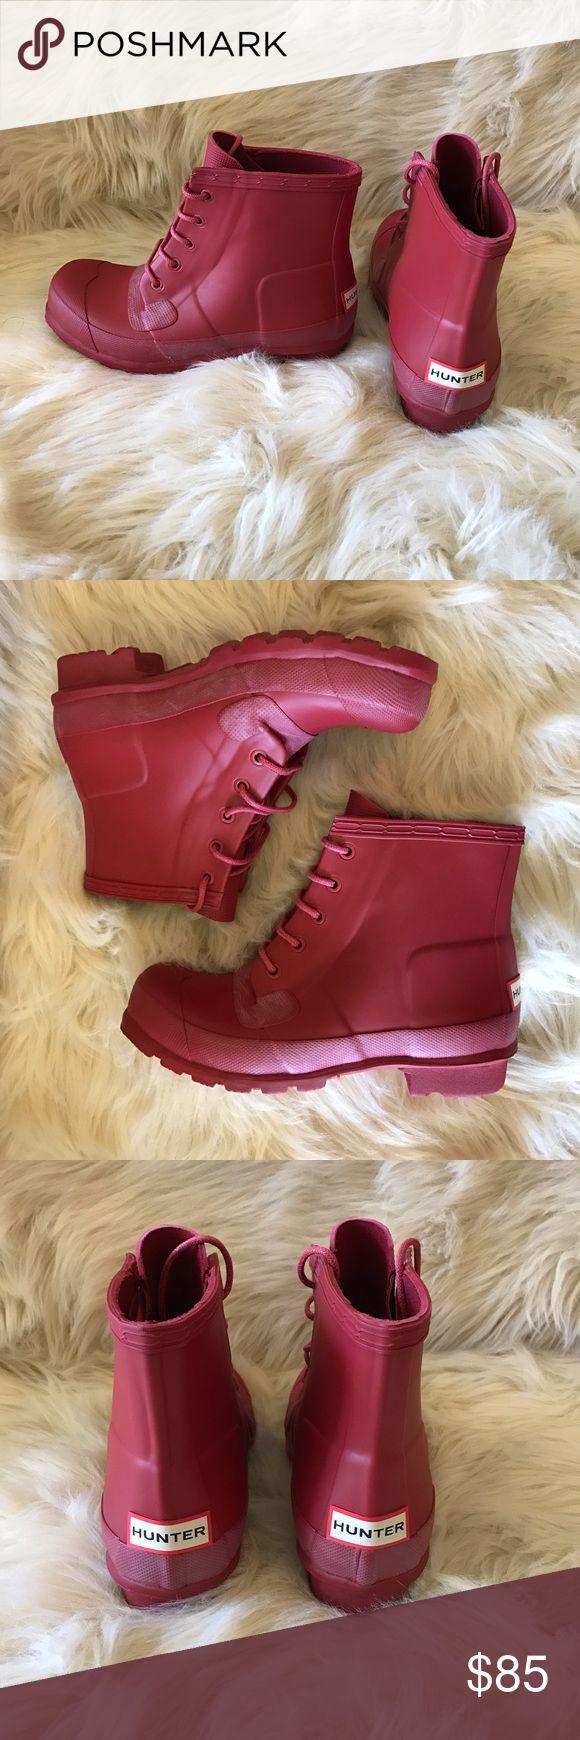 HUNTER Original Lace Up Rain Boots HUNTER Original Lace Up Rain Boots. Color: Military Red. Size 7. Brand new with box! Hunter Shoes Winter & Rain Boots